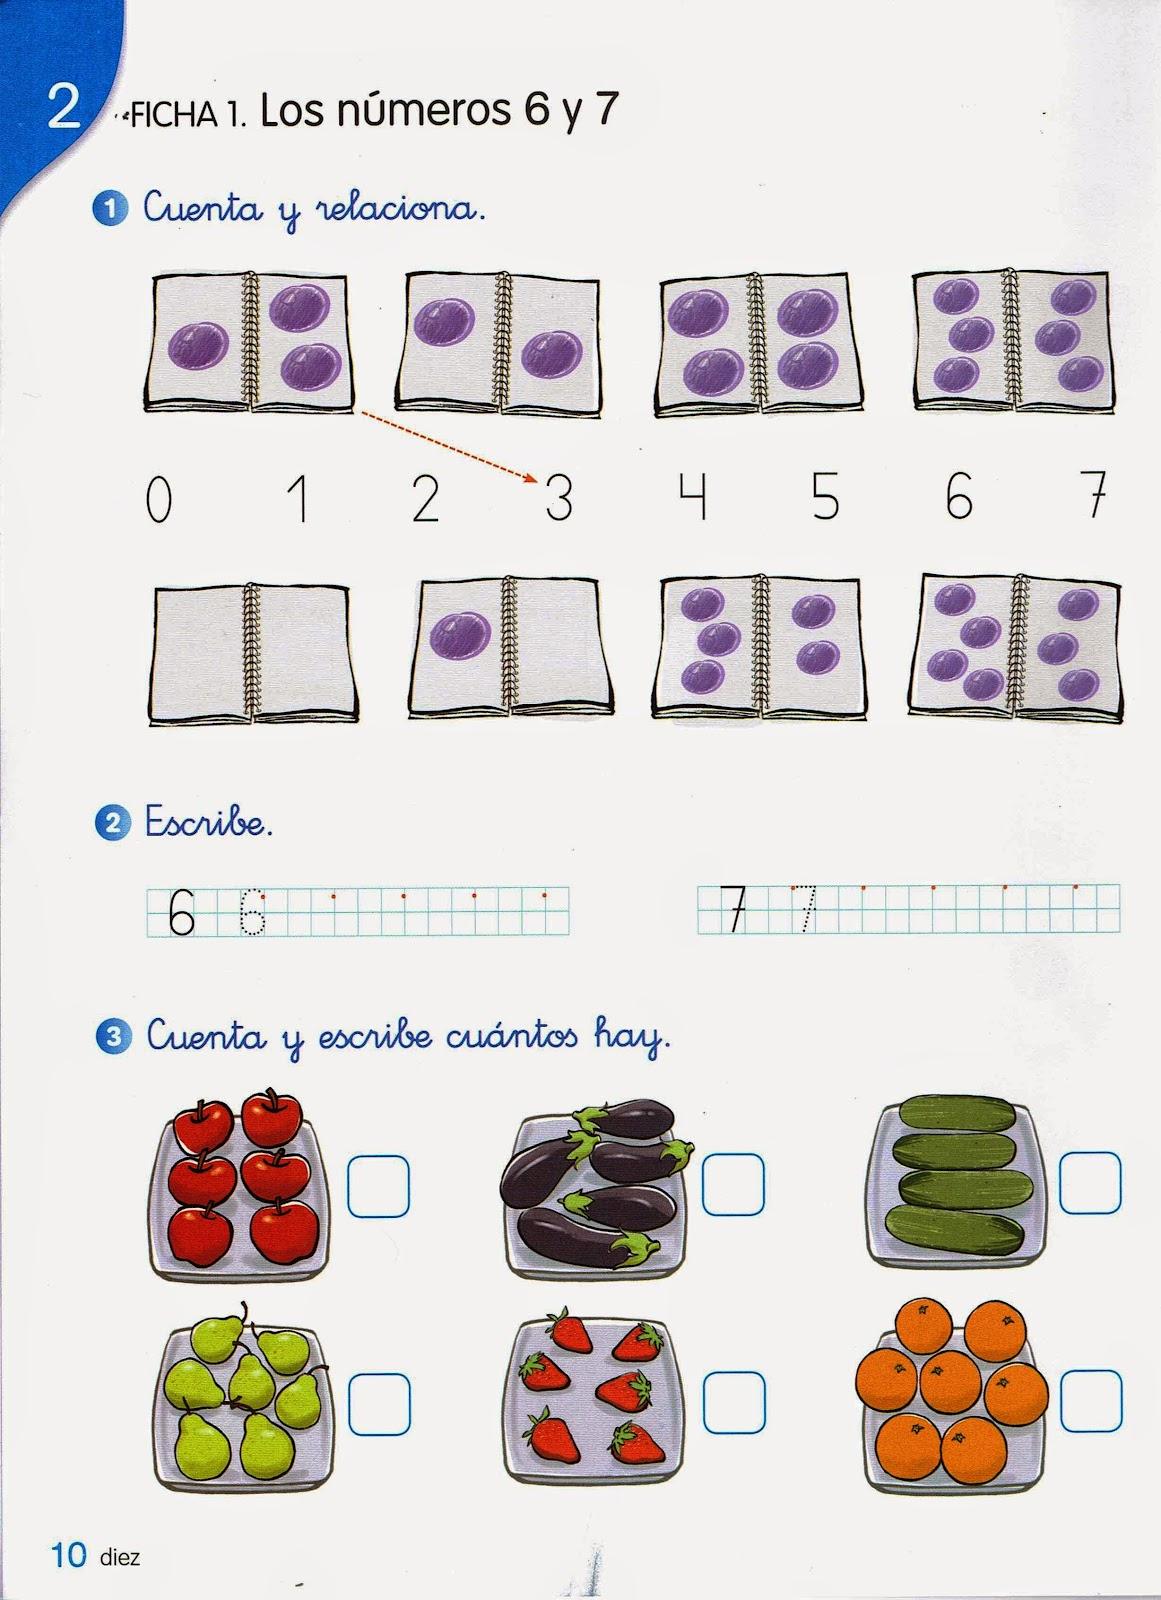 https://picasaweb.google.com/100252597810384634858/MatematicasTema2?authuser=0&feat=directlink